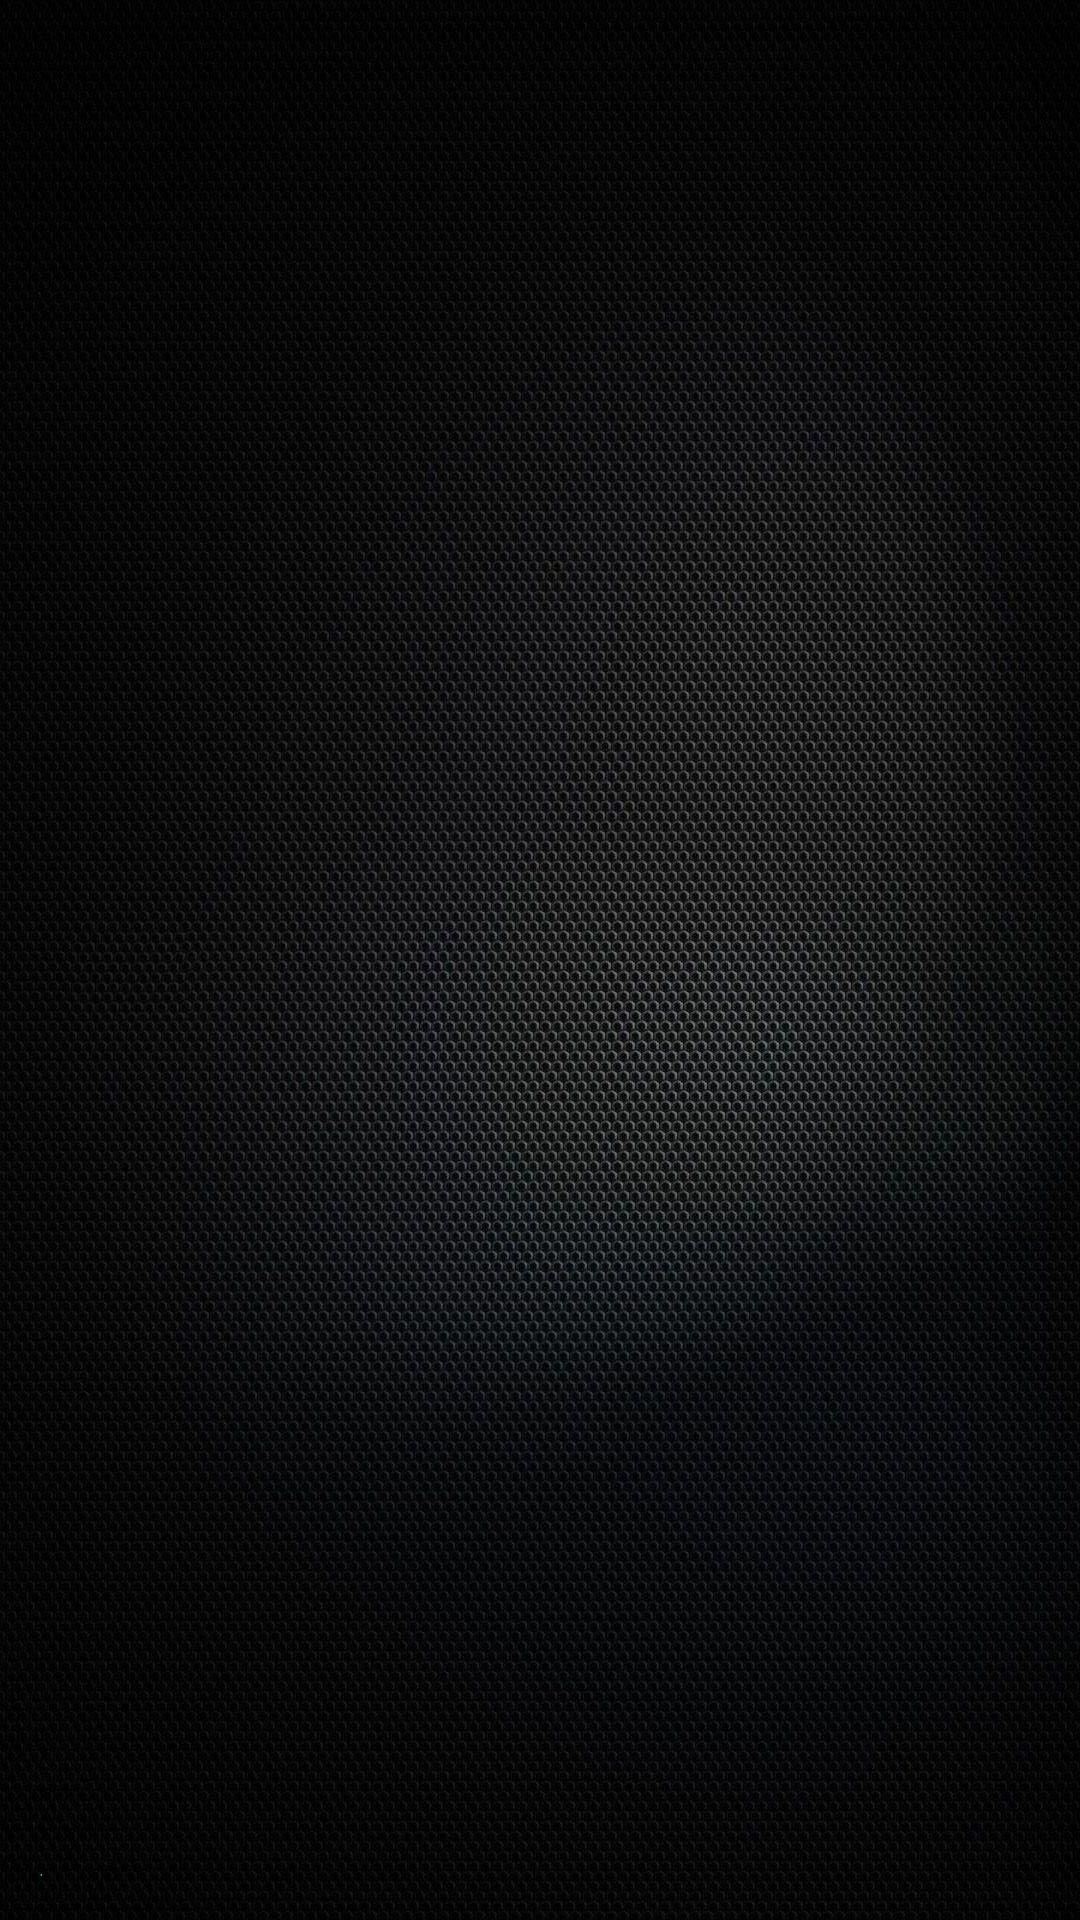 Dark Amoled Wallpapers Wallpaper Cave